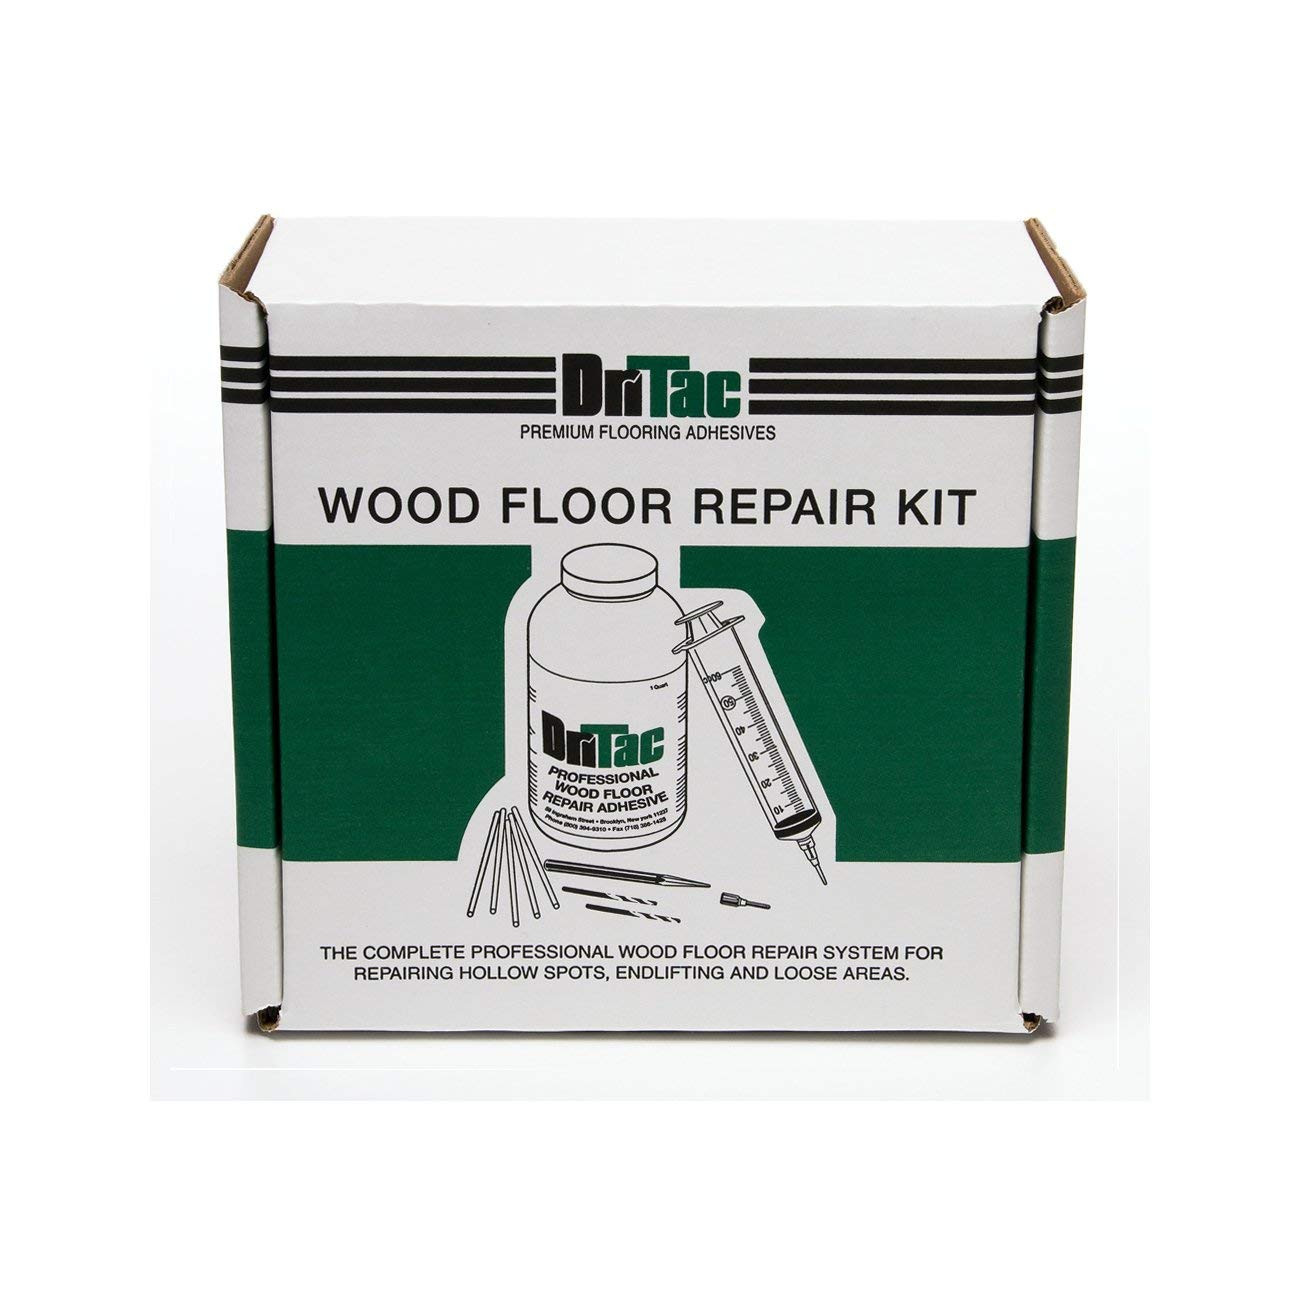 best wood filler for hardwood floors of amazon com dritac wood floor repair kit engineered flooring only for amazon com dritac wood floor repair kit engineered flooring only 32oz home kitchen